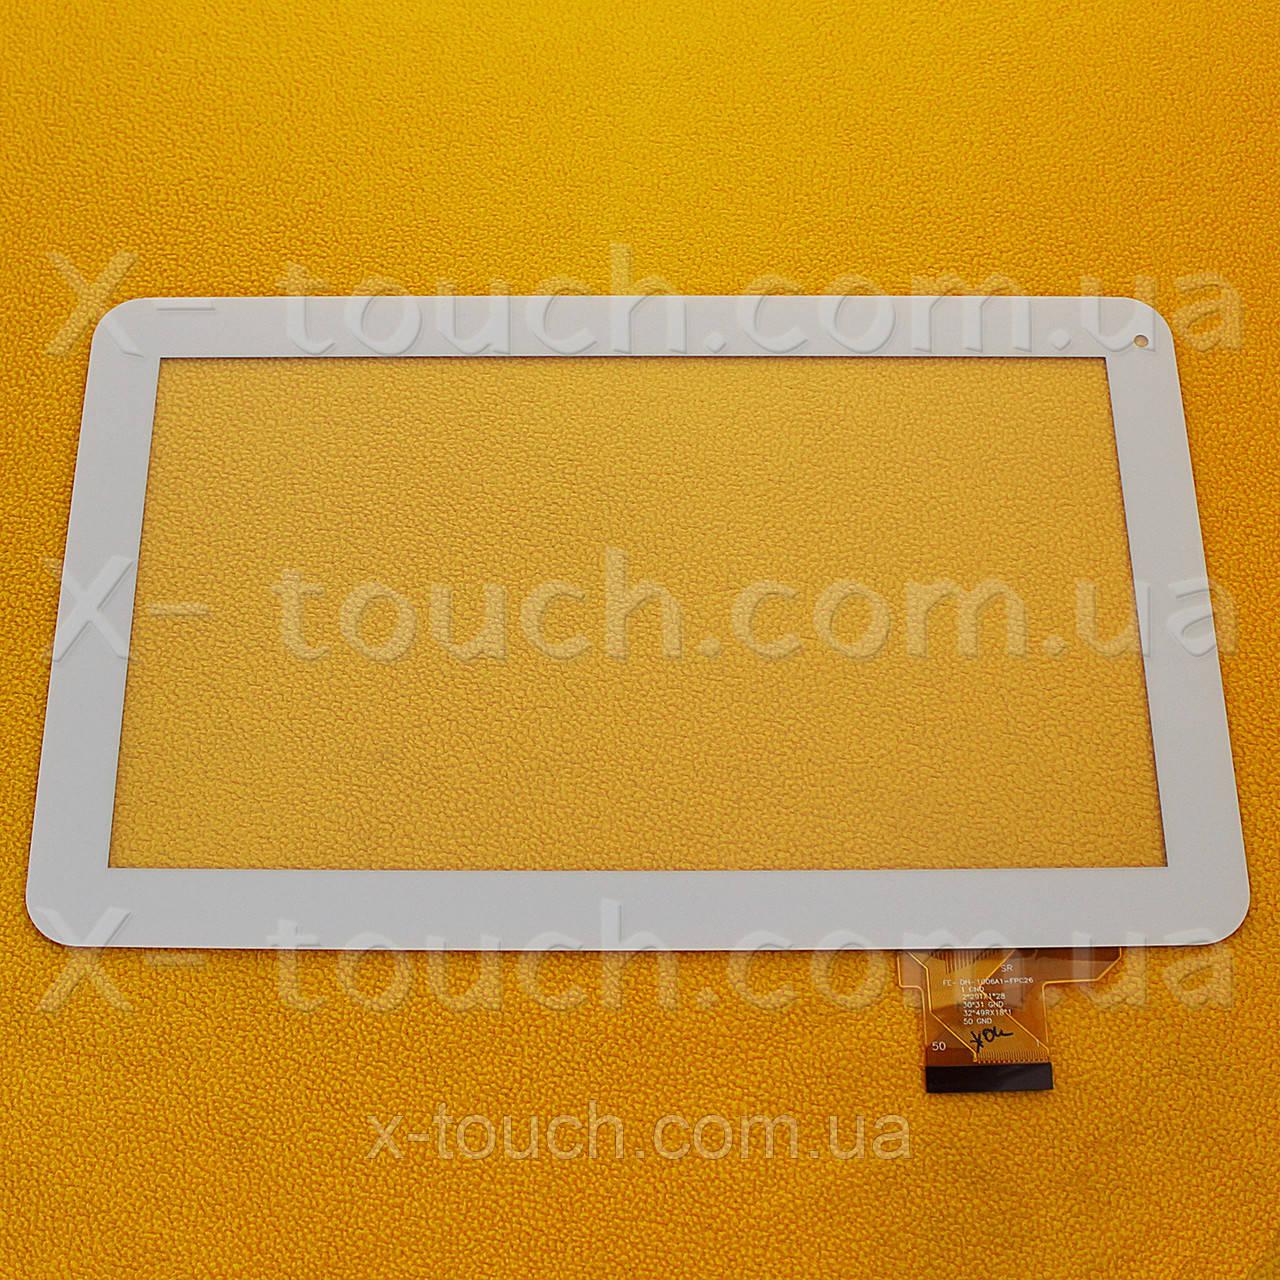 Тачскрин, сенсор  DH-0901A1-FPC10  для планшета